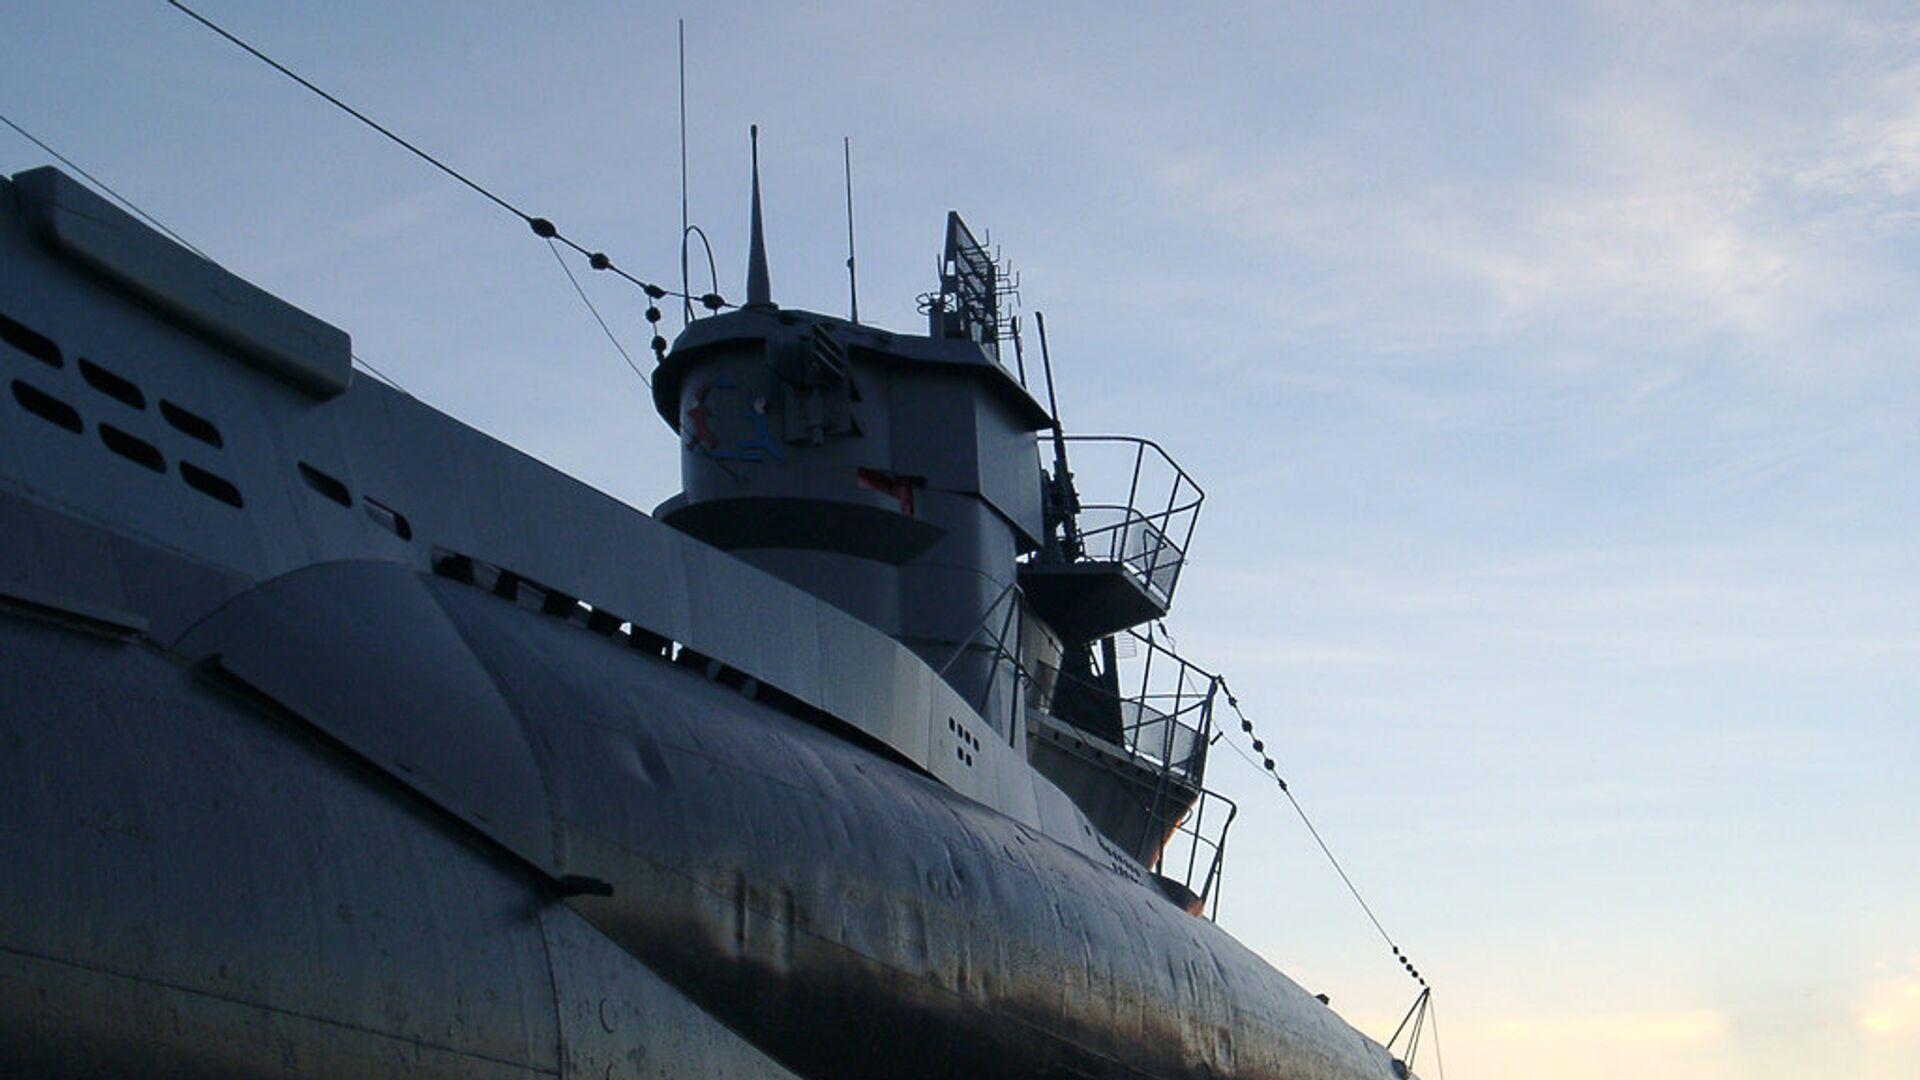 Un submarino alemán - Sputnik Mundo, 1920, 30.03.2021